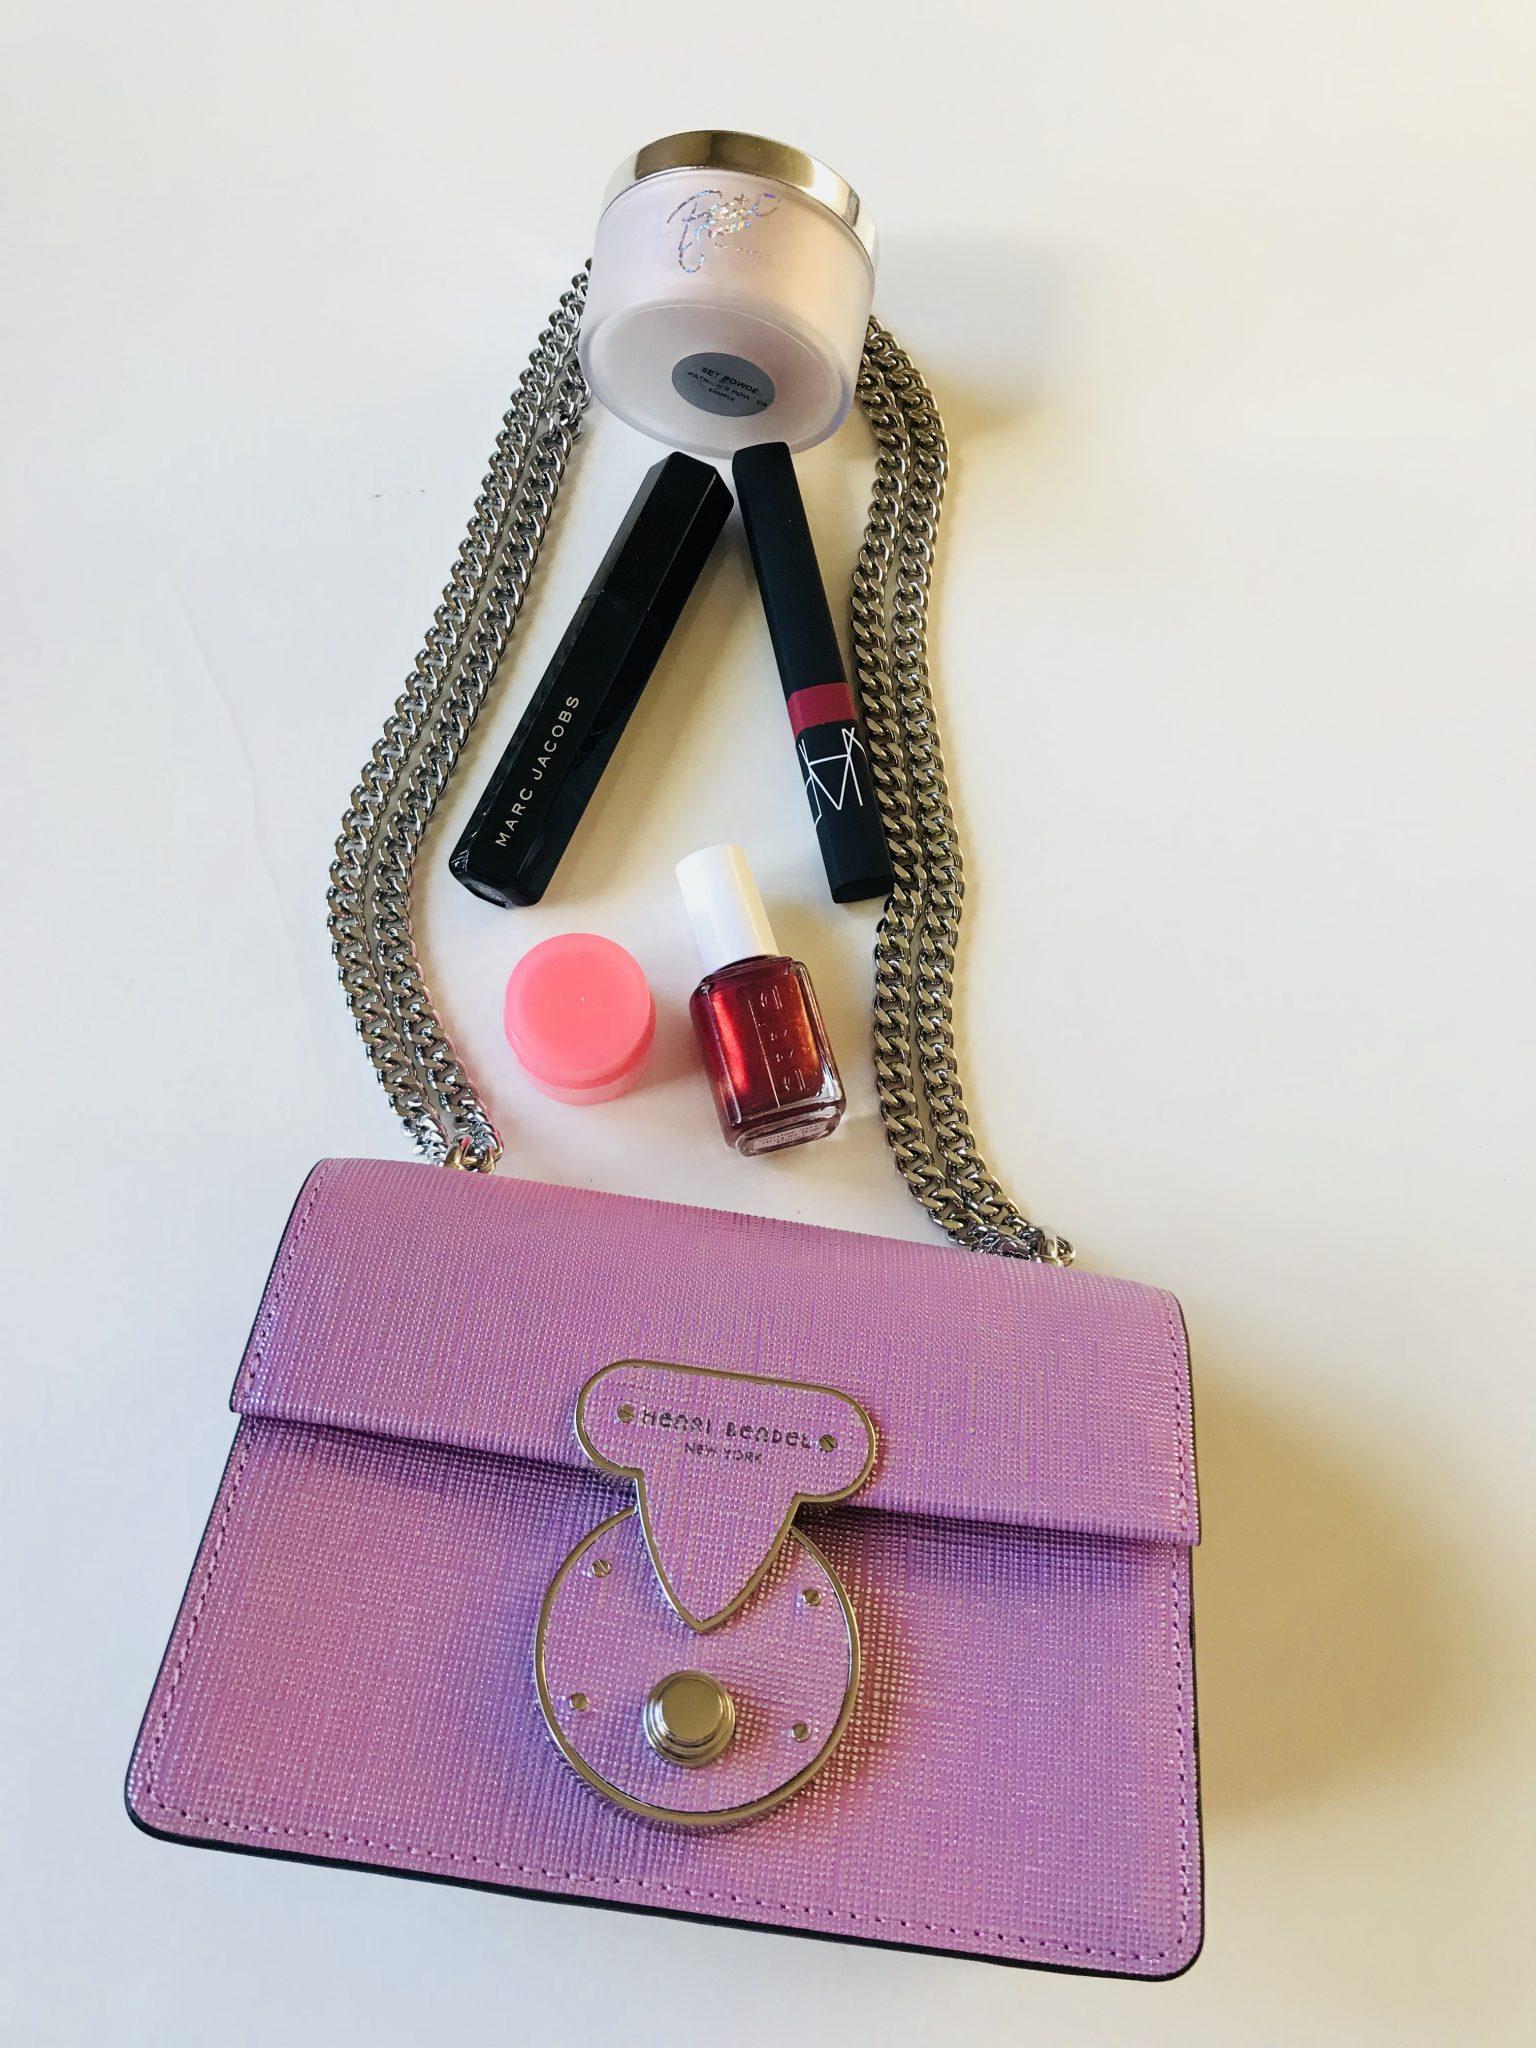 What's In My Bag? Henri Bendel Warren Street Micro Crossbody Bag